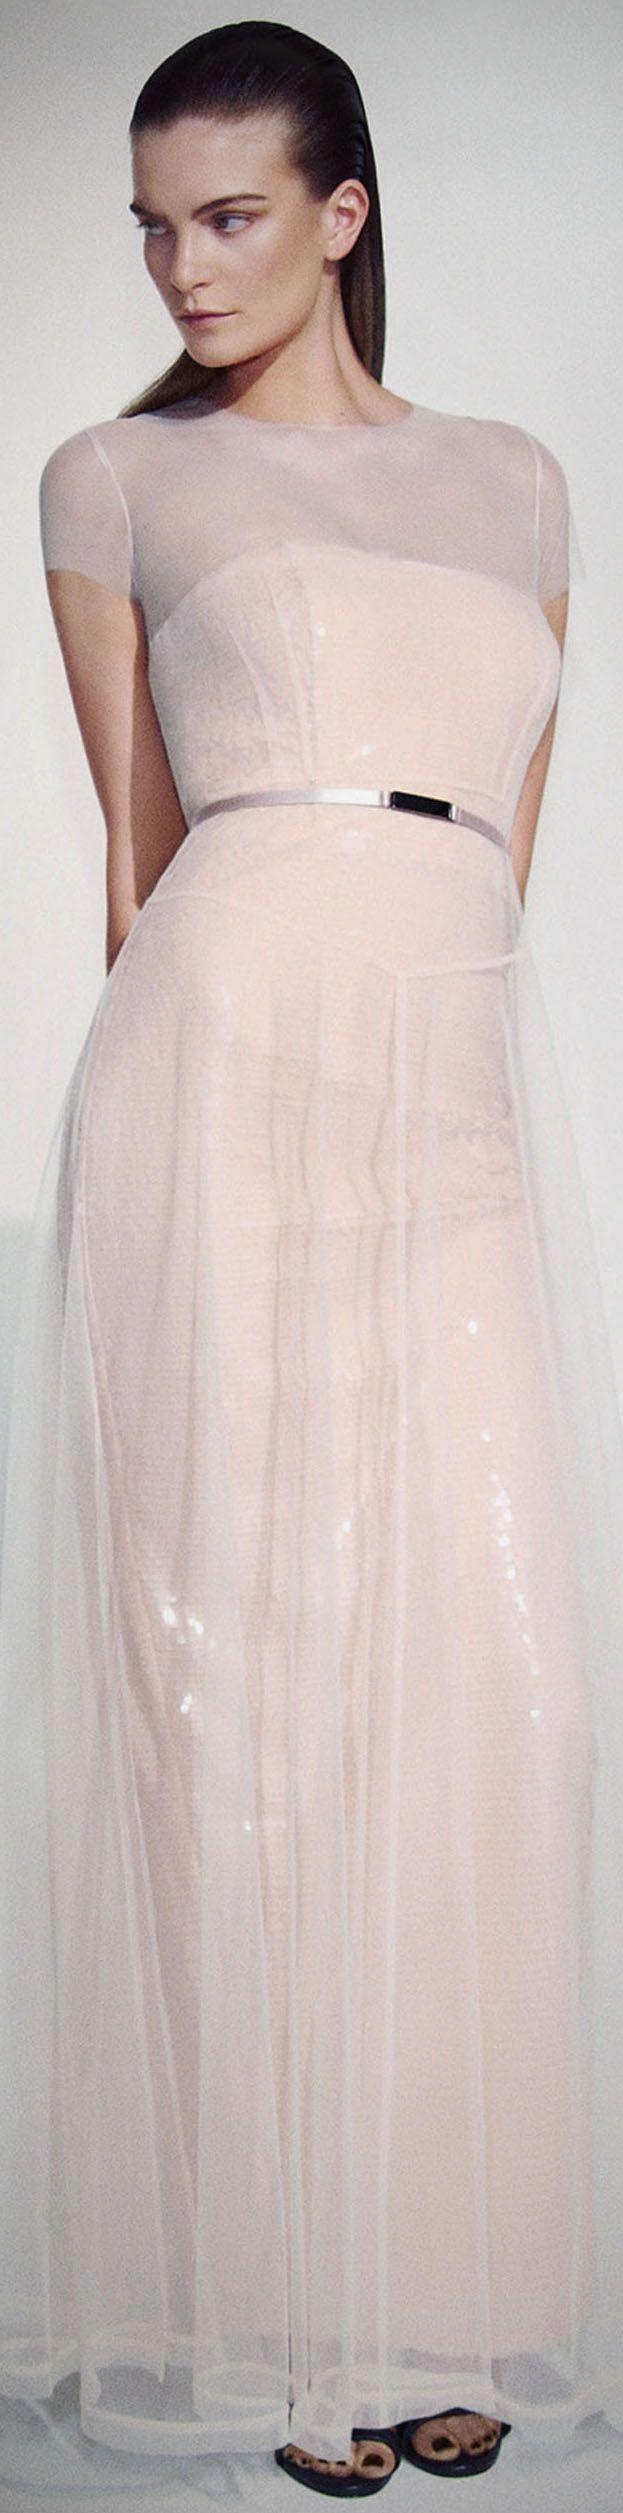 25 cute debenhams dresses ideas on pinterest wedding dress over this has a bit more coverage wedding dresses for brides over 50 debenhams prshots ombrellifo Gallery